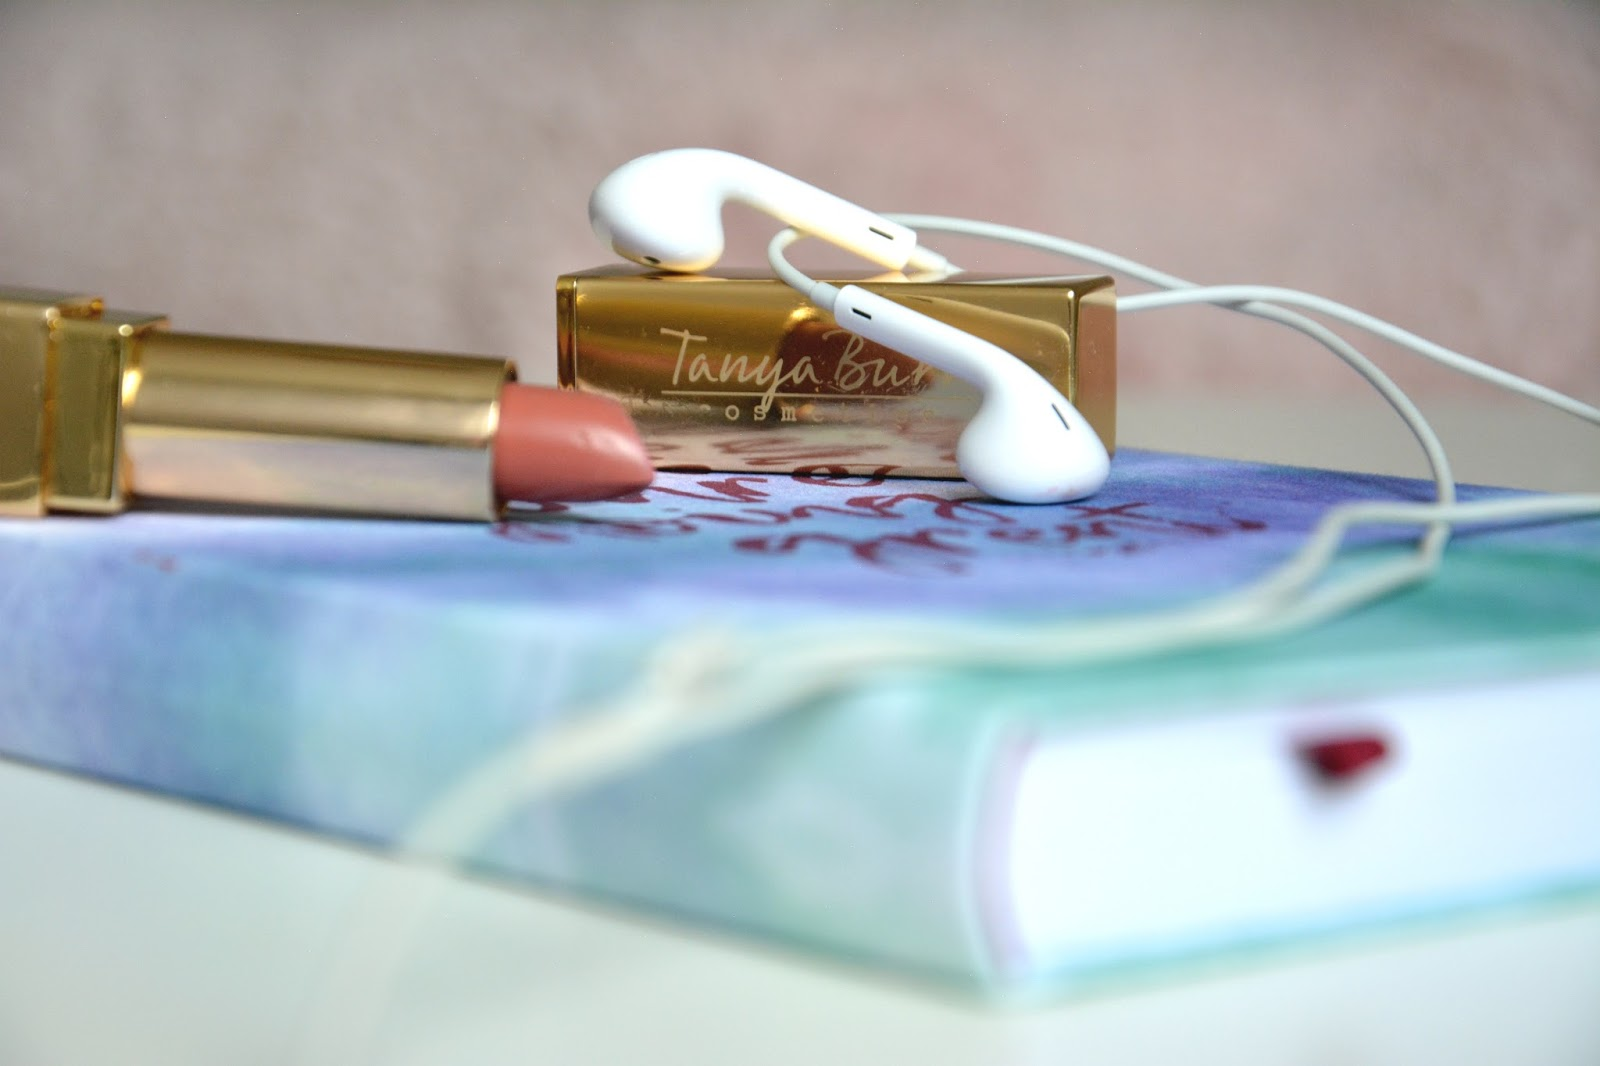 Apple EarPods; Maisons Du Monde Pineapple Trinket Dish, Hema Notebook; Tanya Burr Lipstick Pink Cocoa